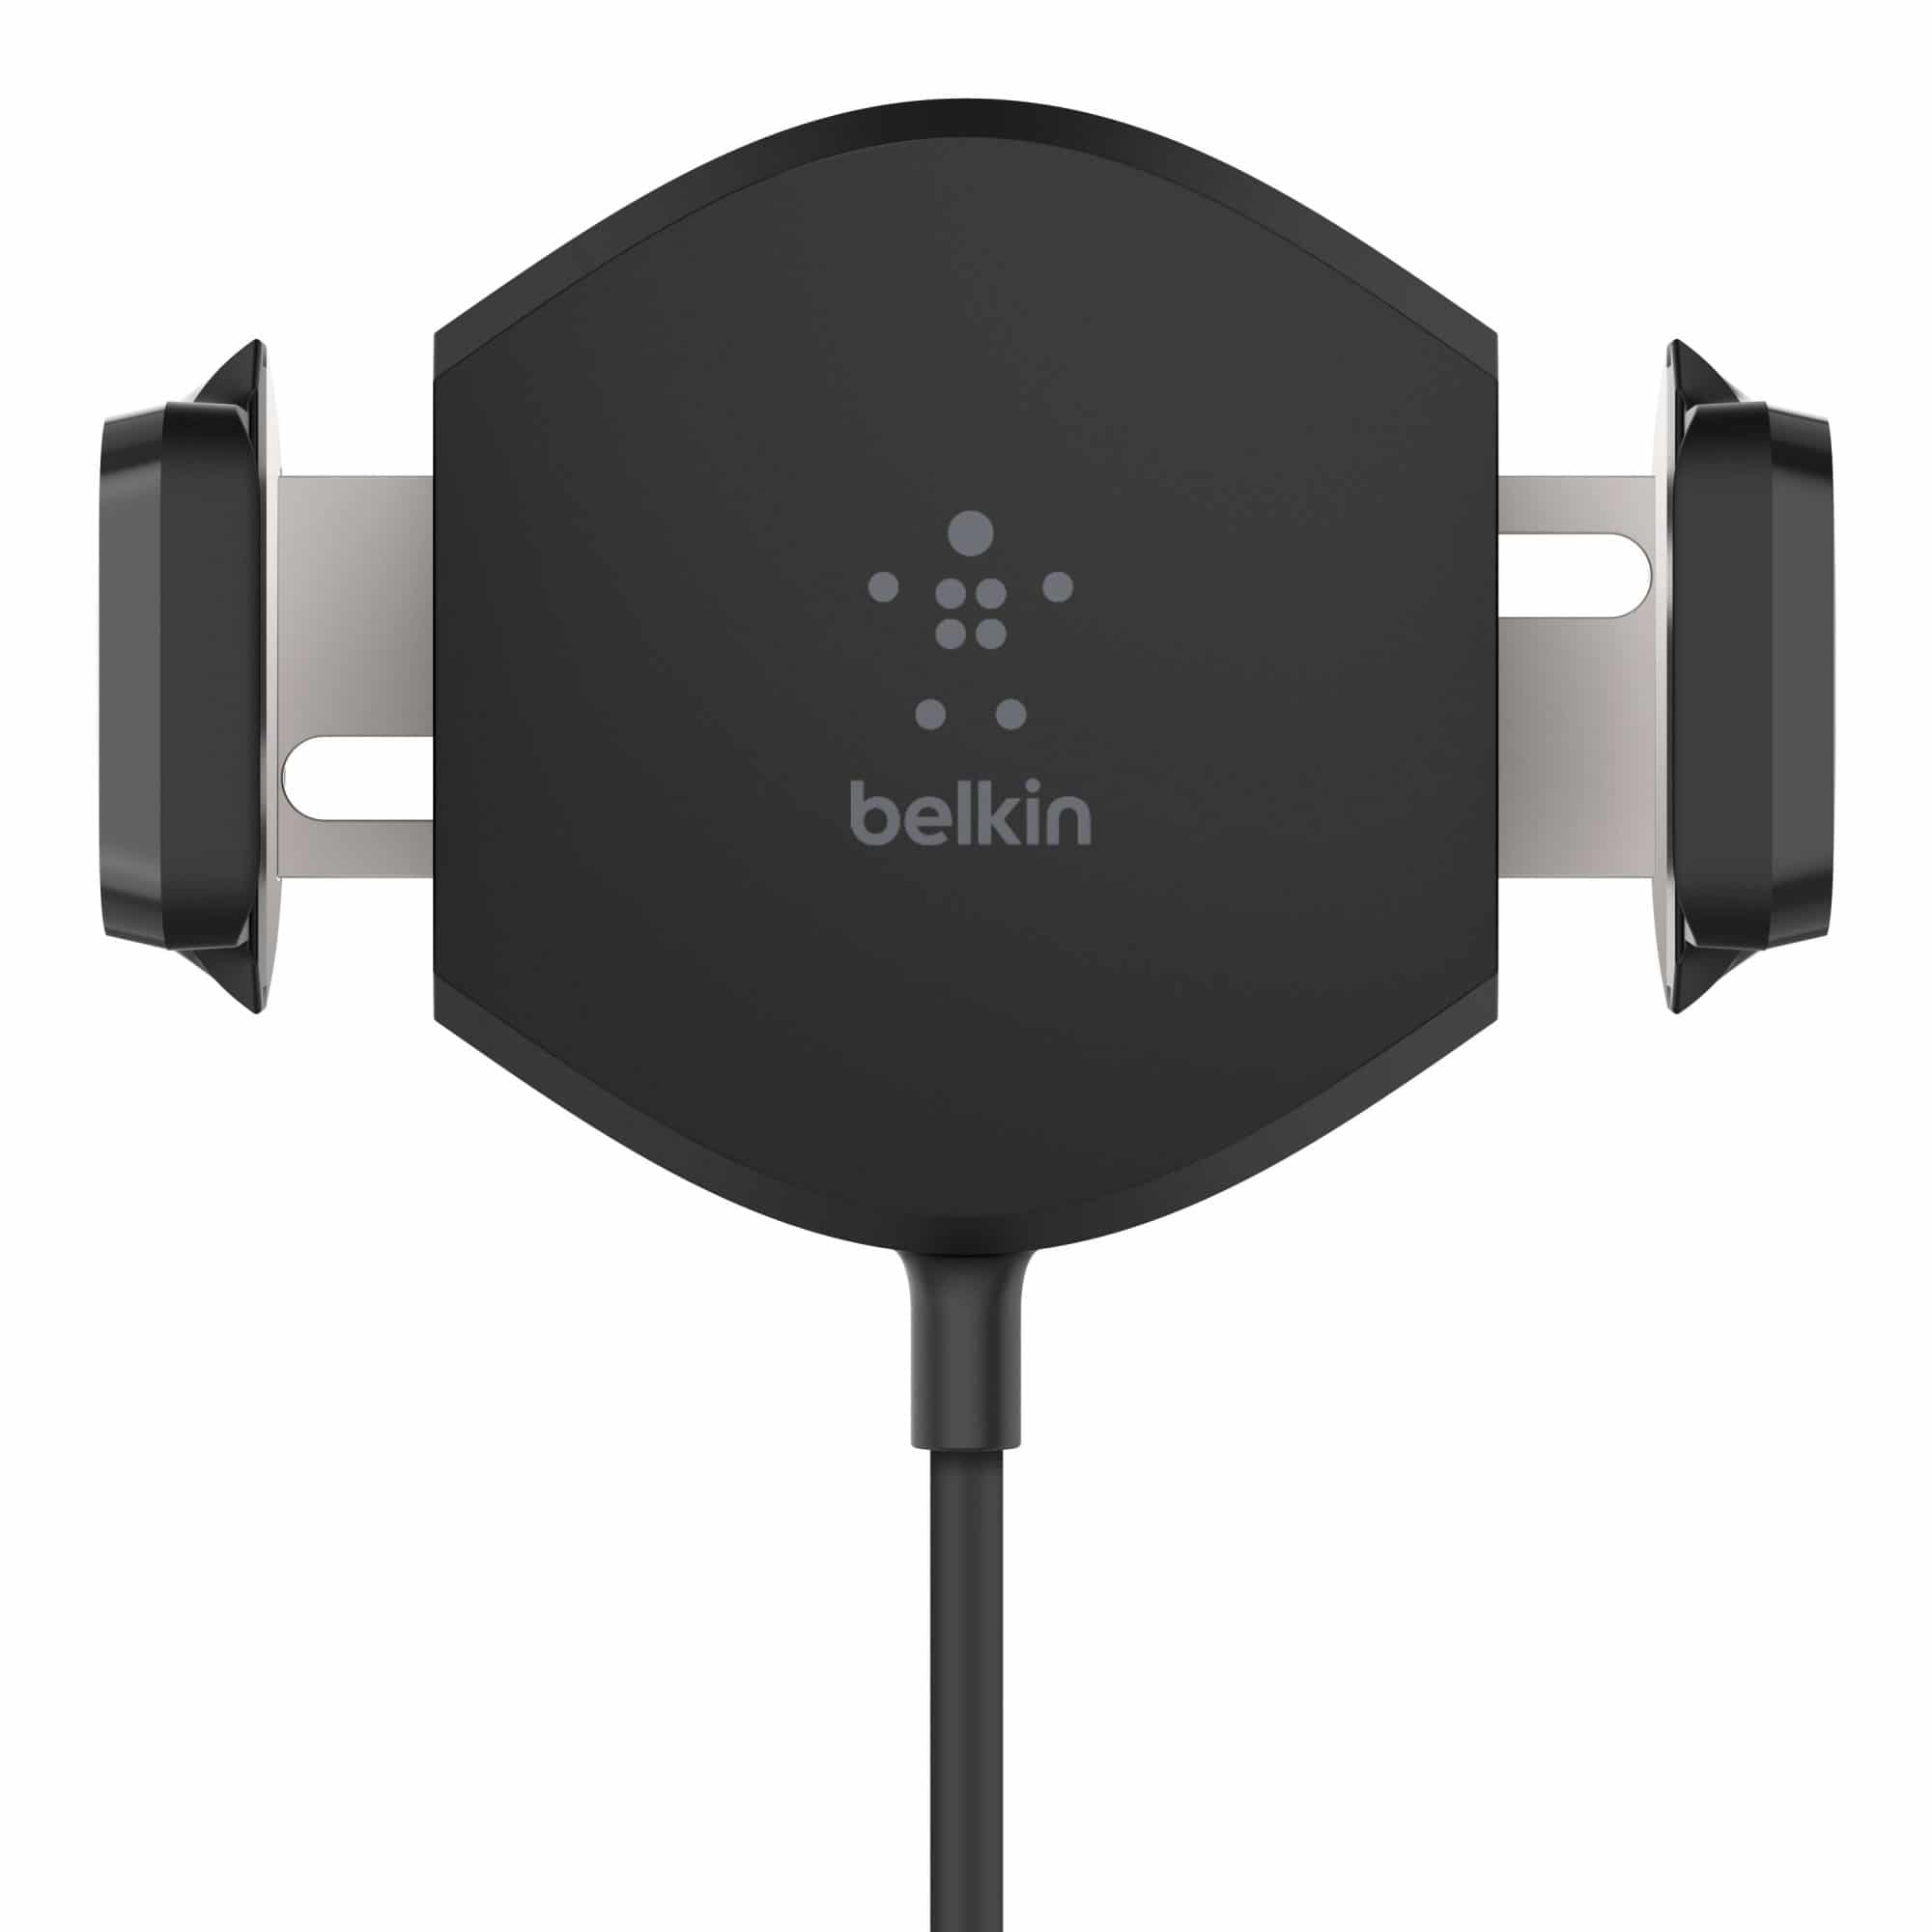 belkin เพิ่ม 2 ผลิตภัณฑ์ในกลุ่ม boost↑charge™ - Belkin เพิ่ม 2 ผลิตภัณฑ์ในกลุ่ม BOOST↑CHARGE™